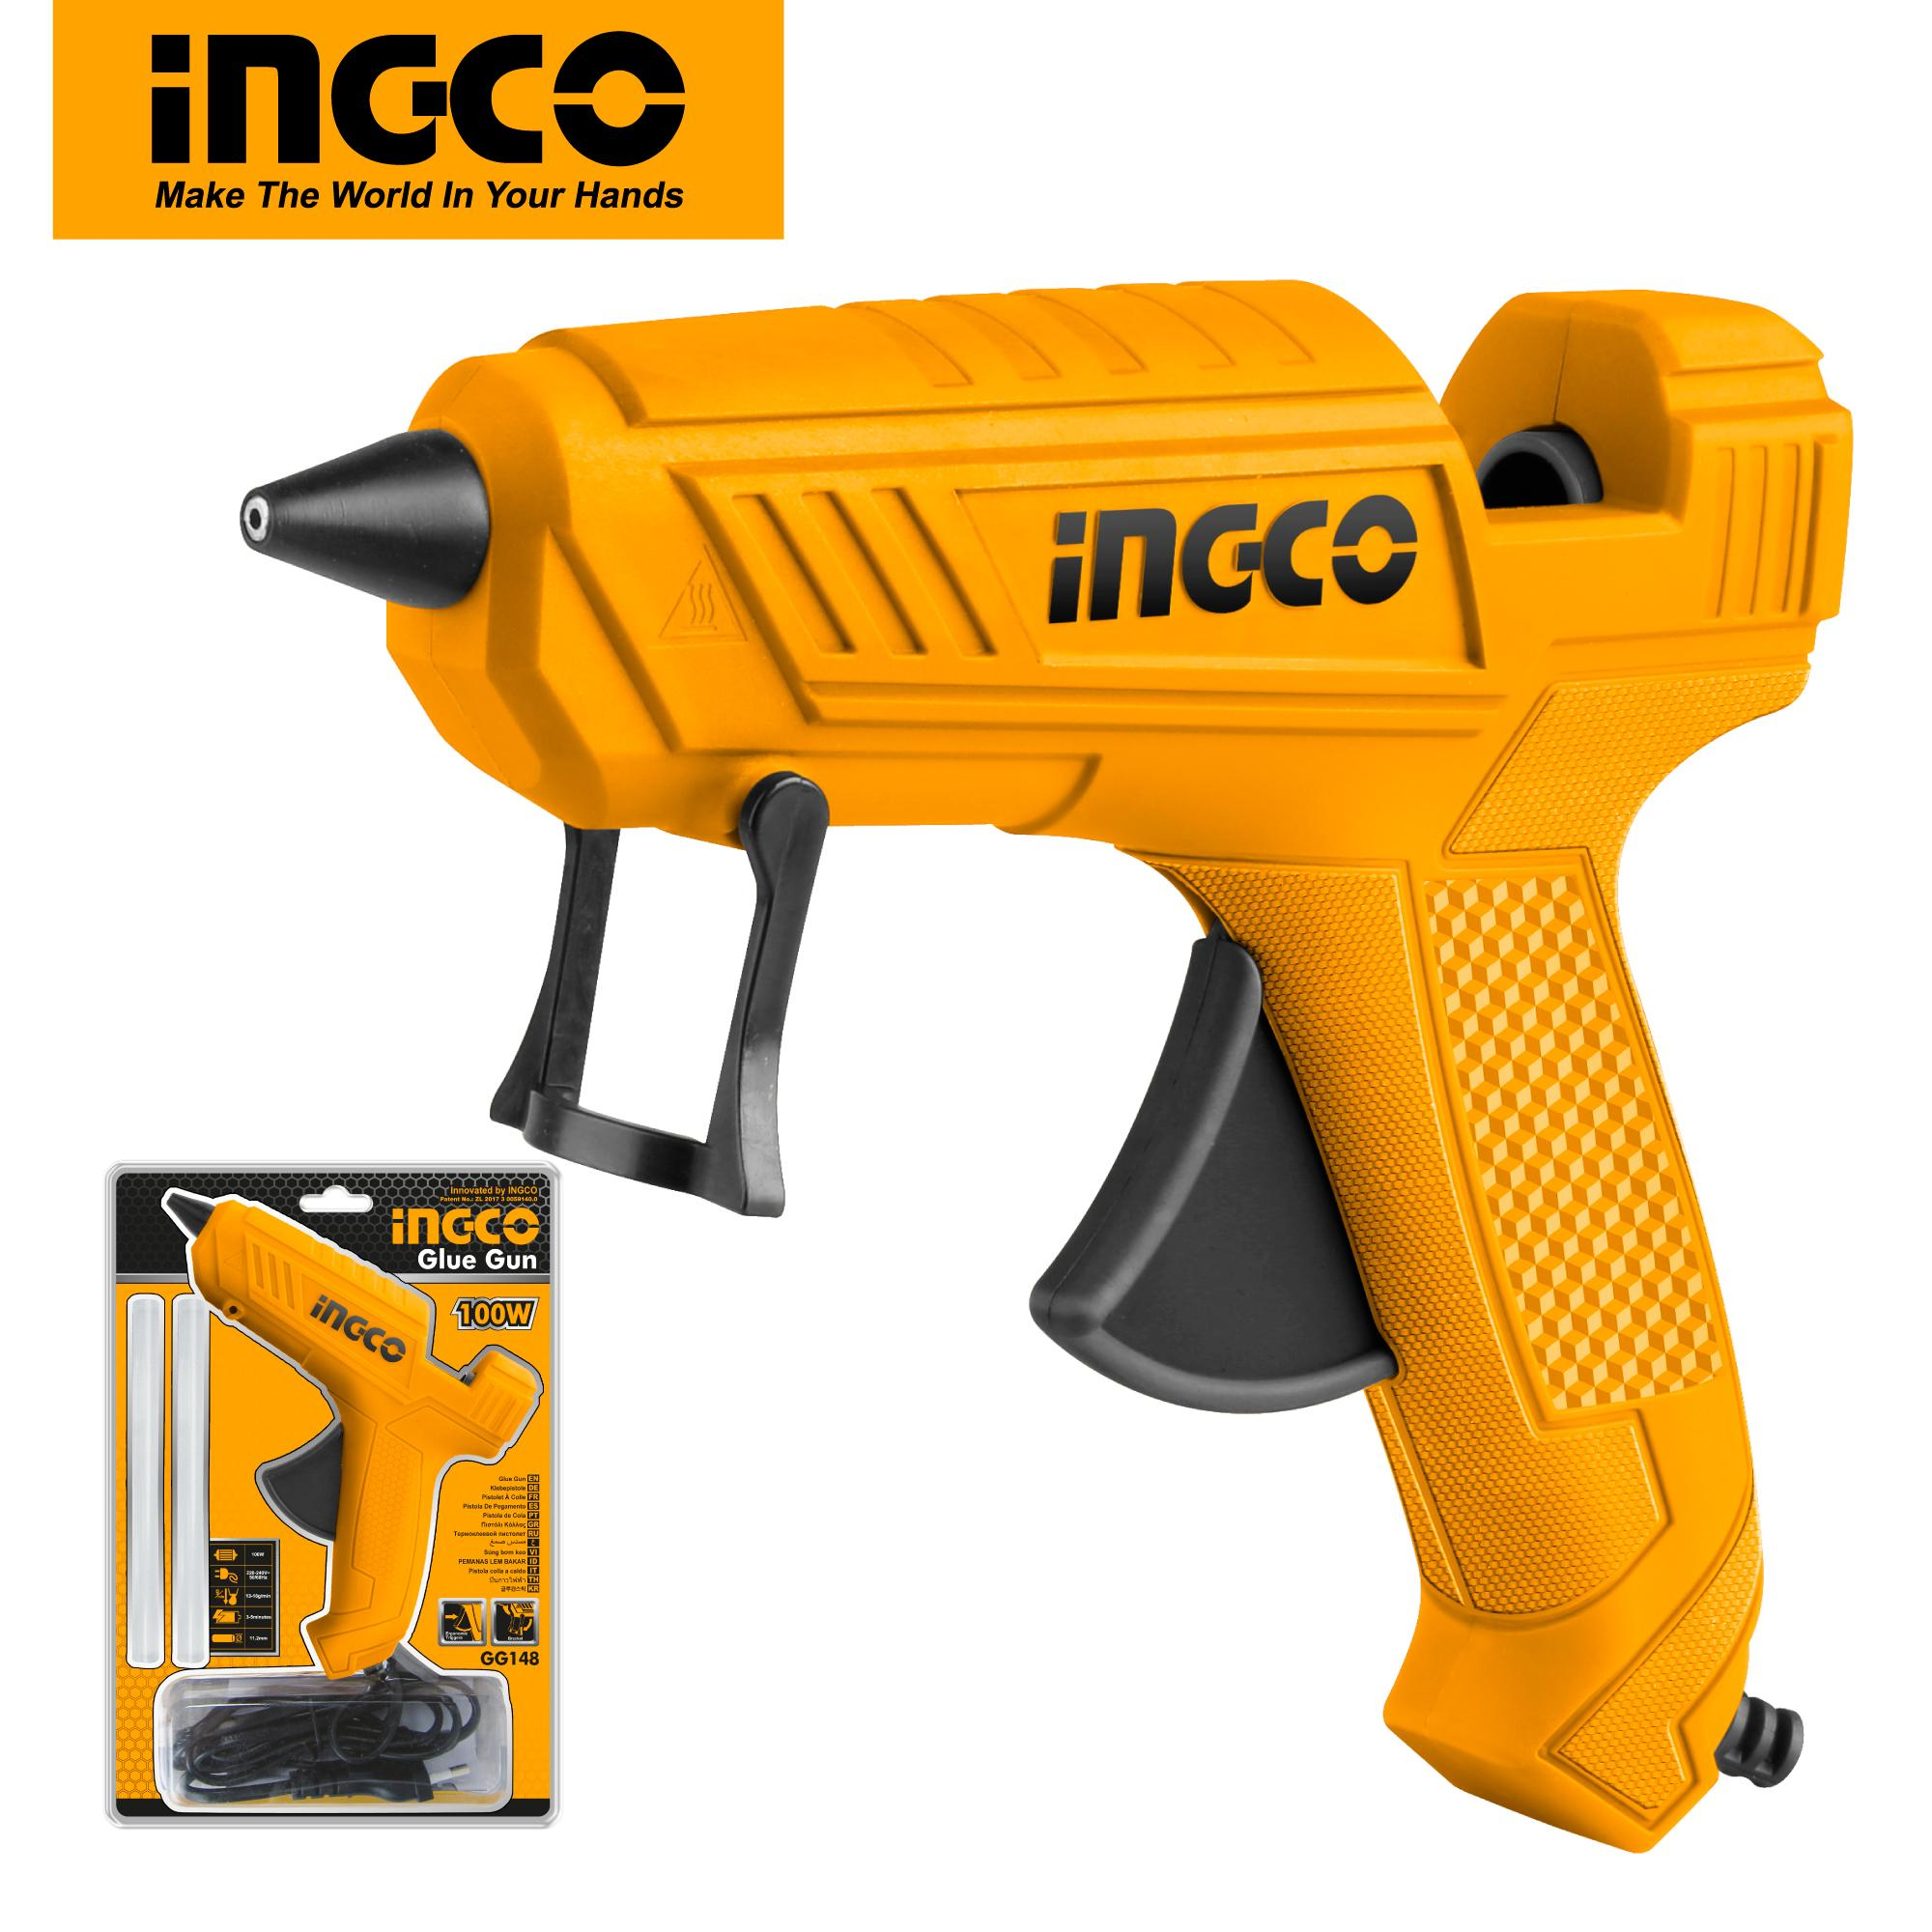 INGCO 20V Corded High Temperature Hot Glue Gun GG148